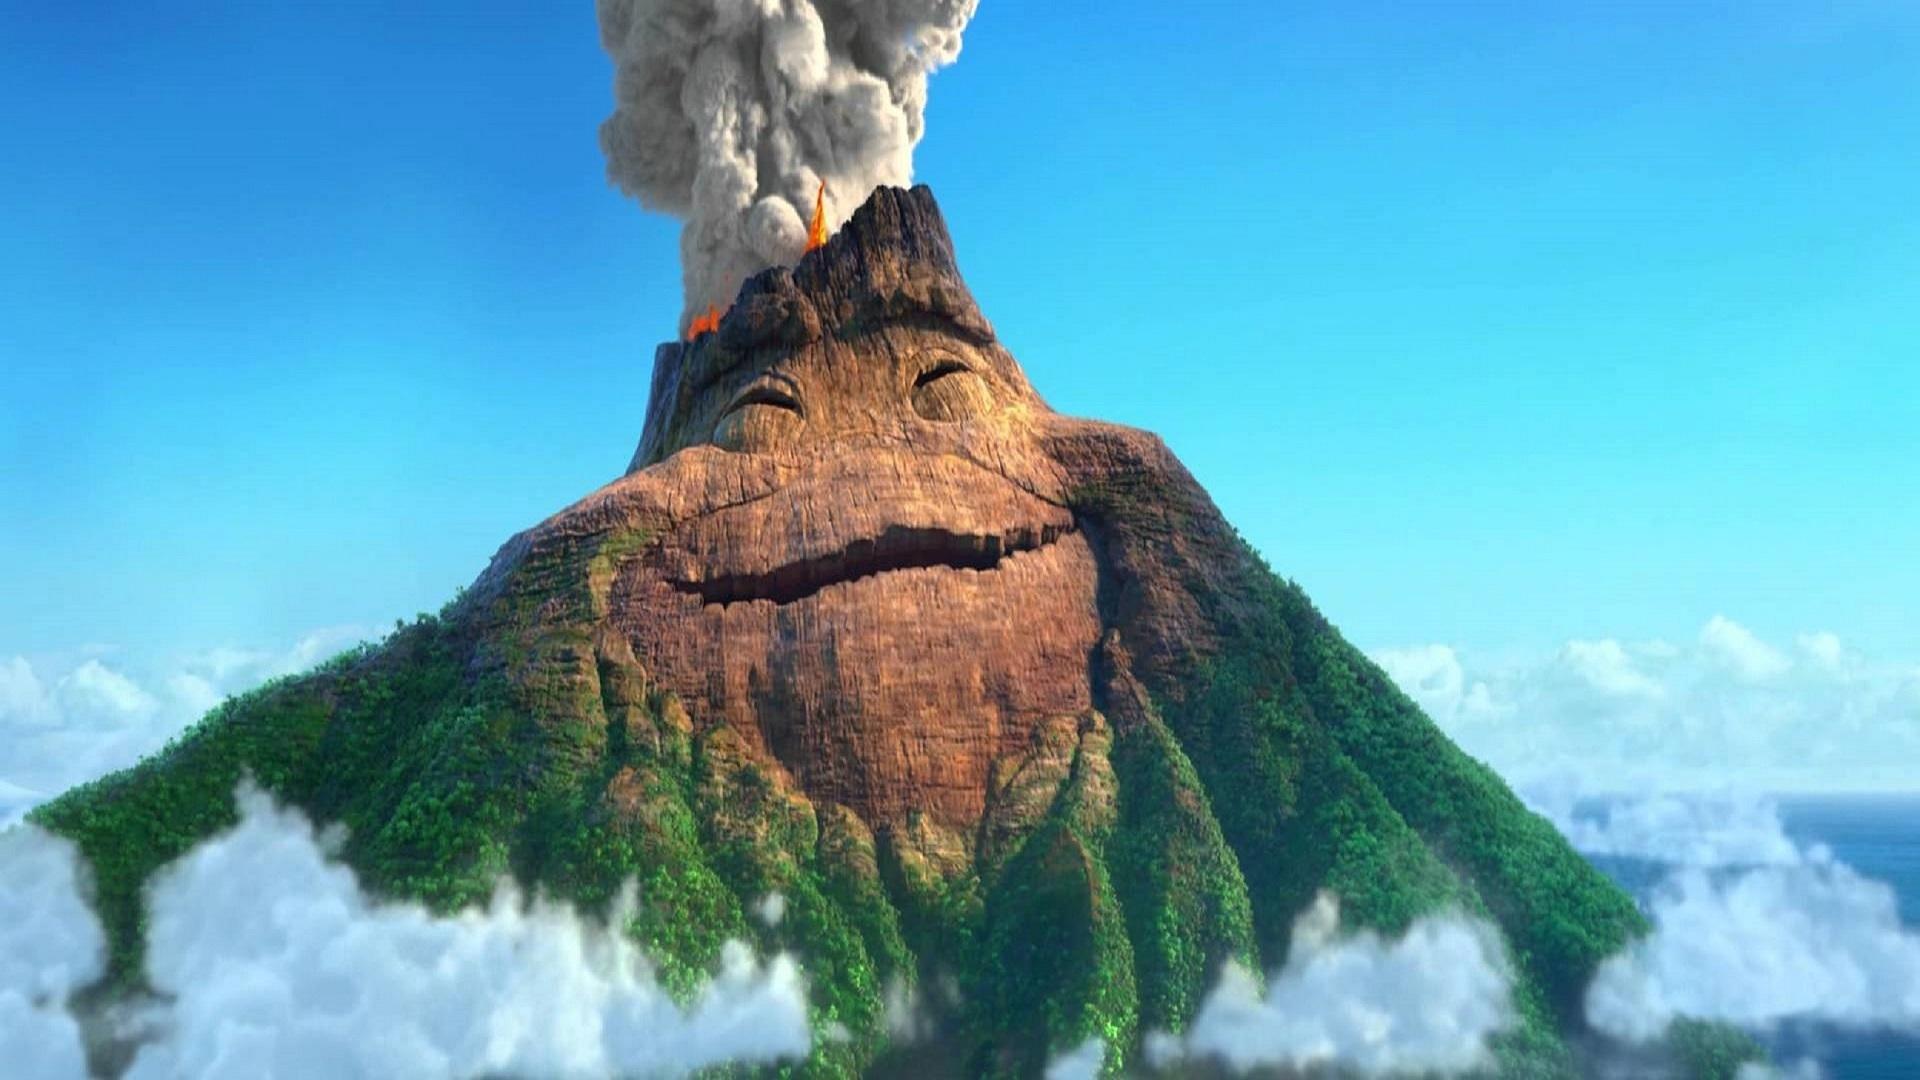 Pixar Lava Wallpaper - WallpaperSafari | 1920 x 1080 jpeg 351kB